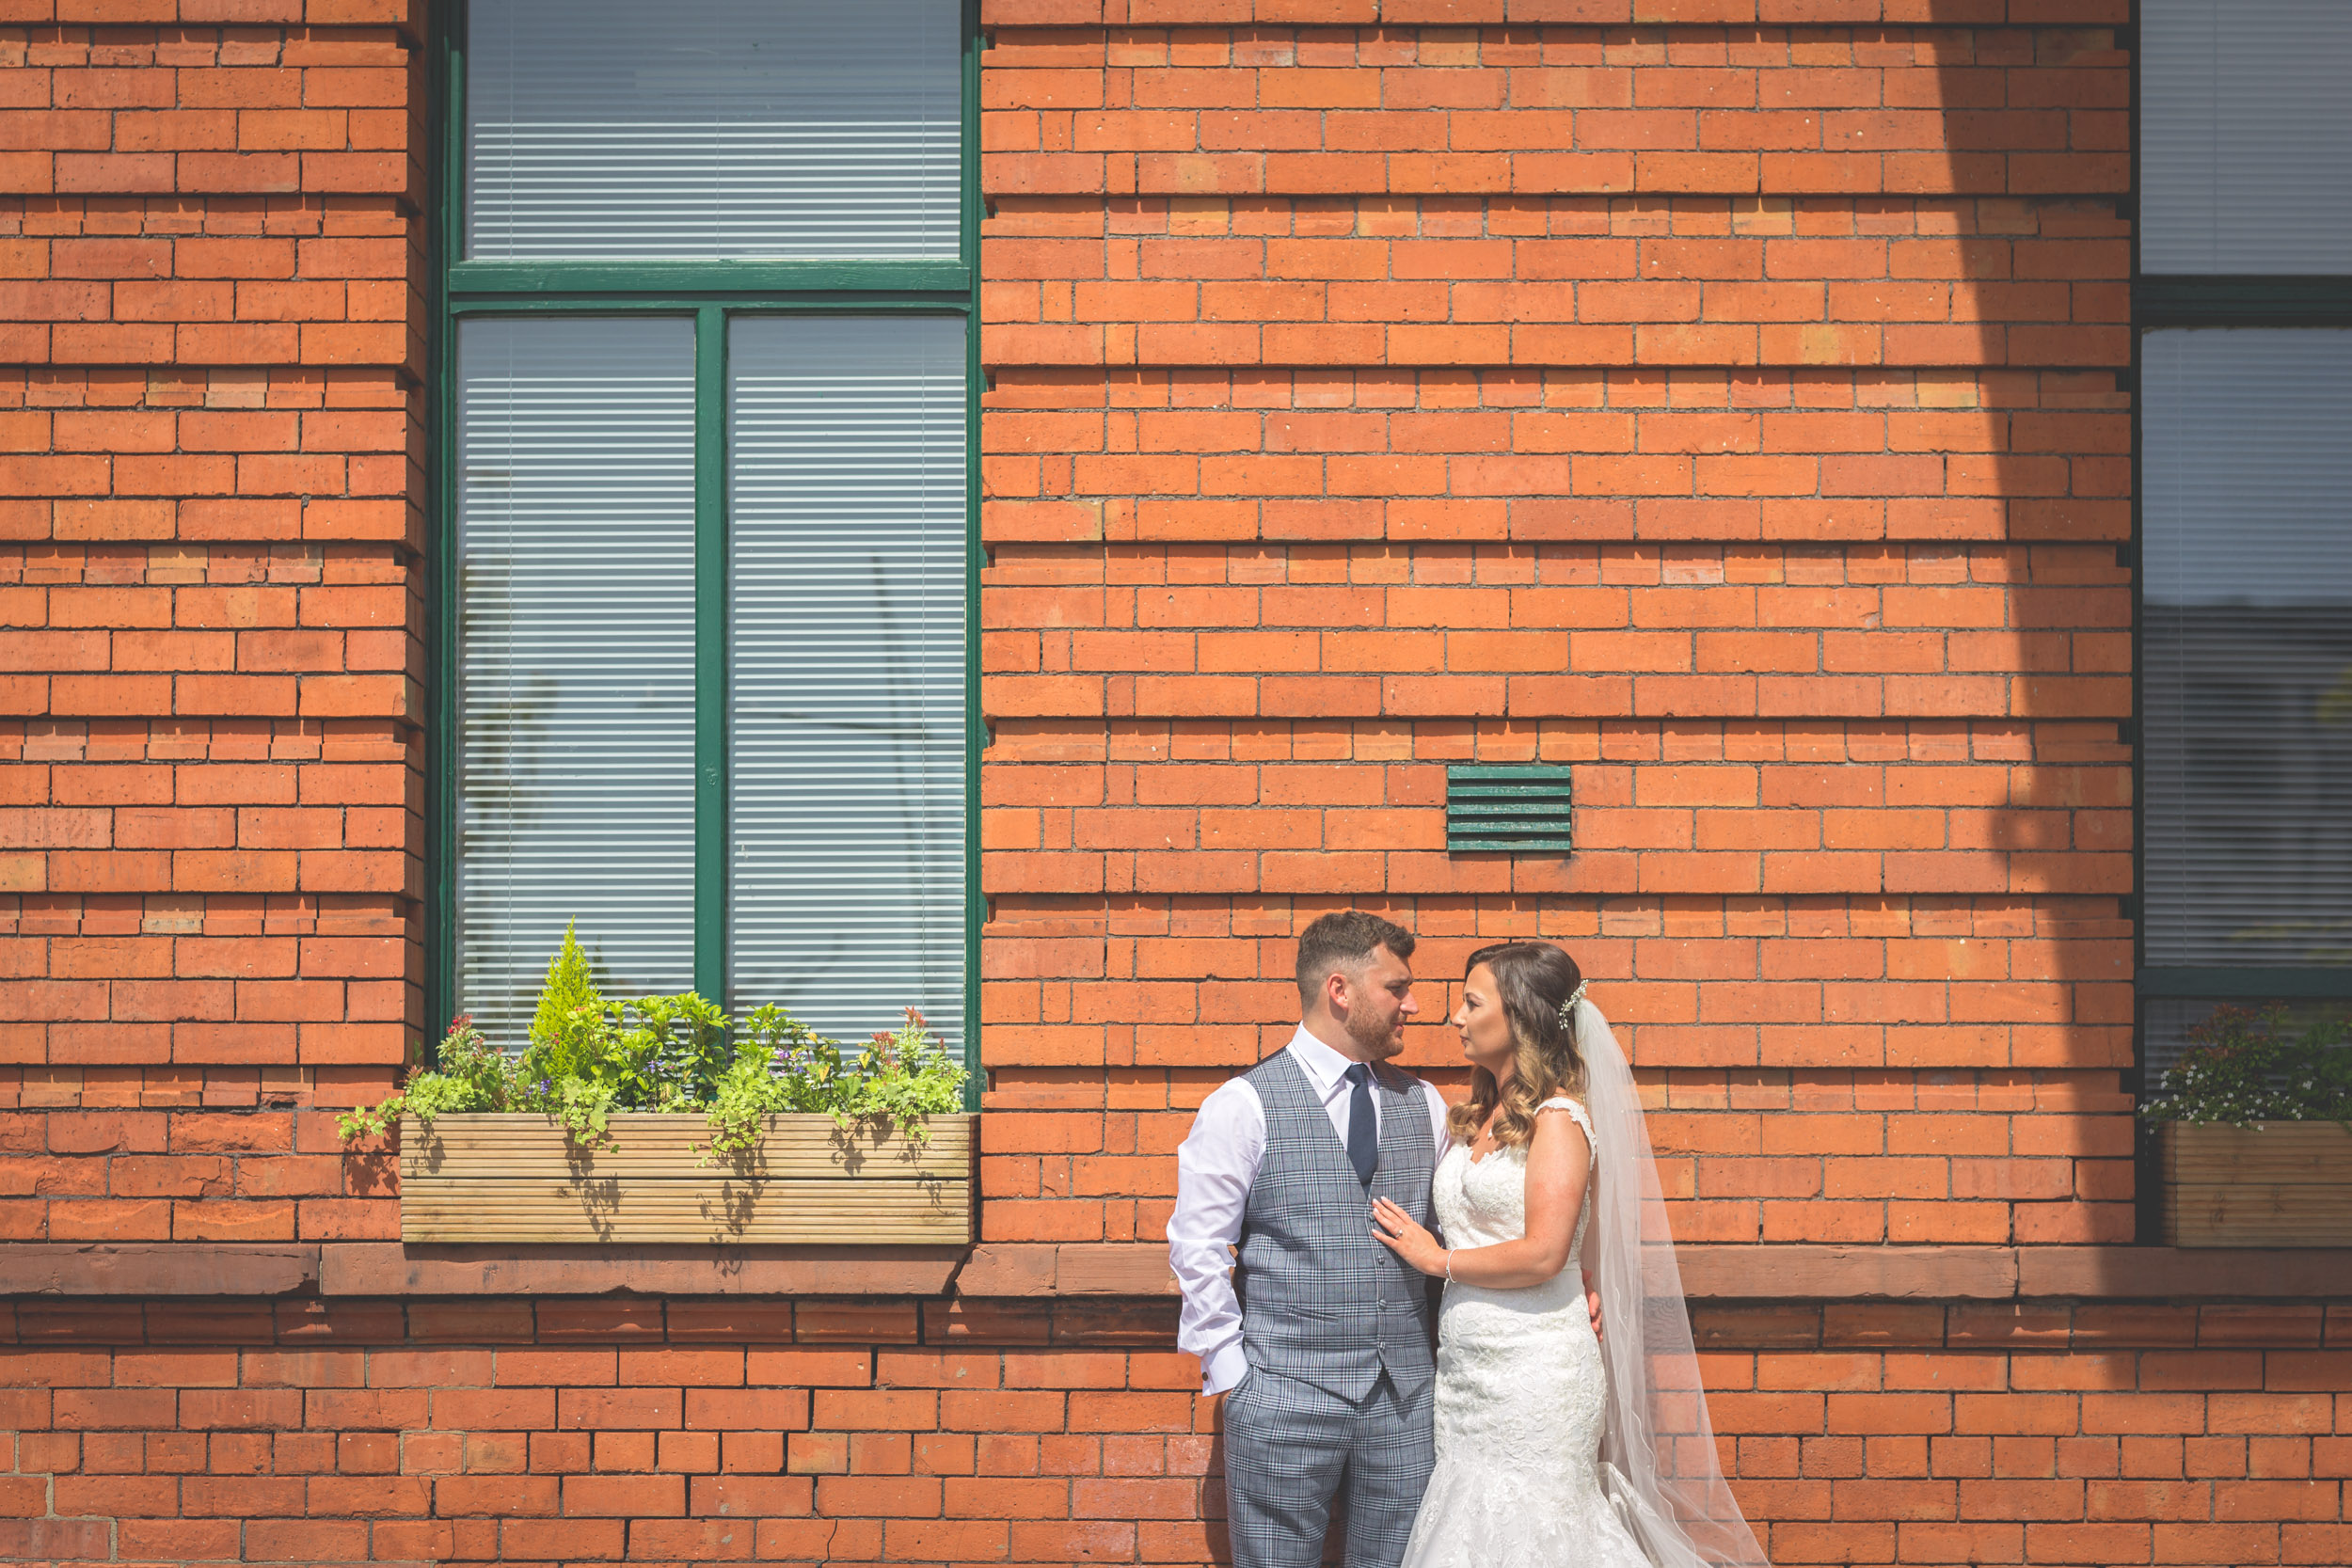 Brian McEwan   Northern Ireland Wedding Photographer   Rebecca & Michael   Portraits-86.jpg